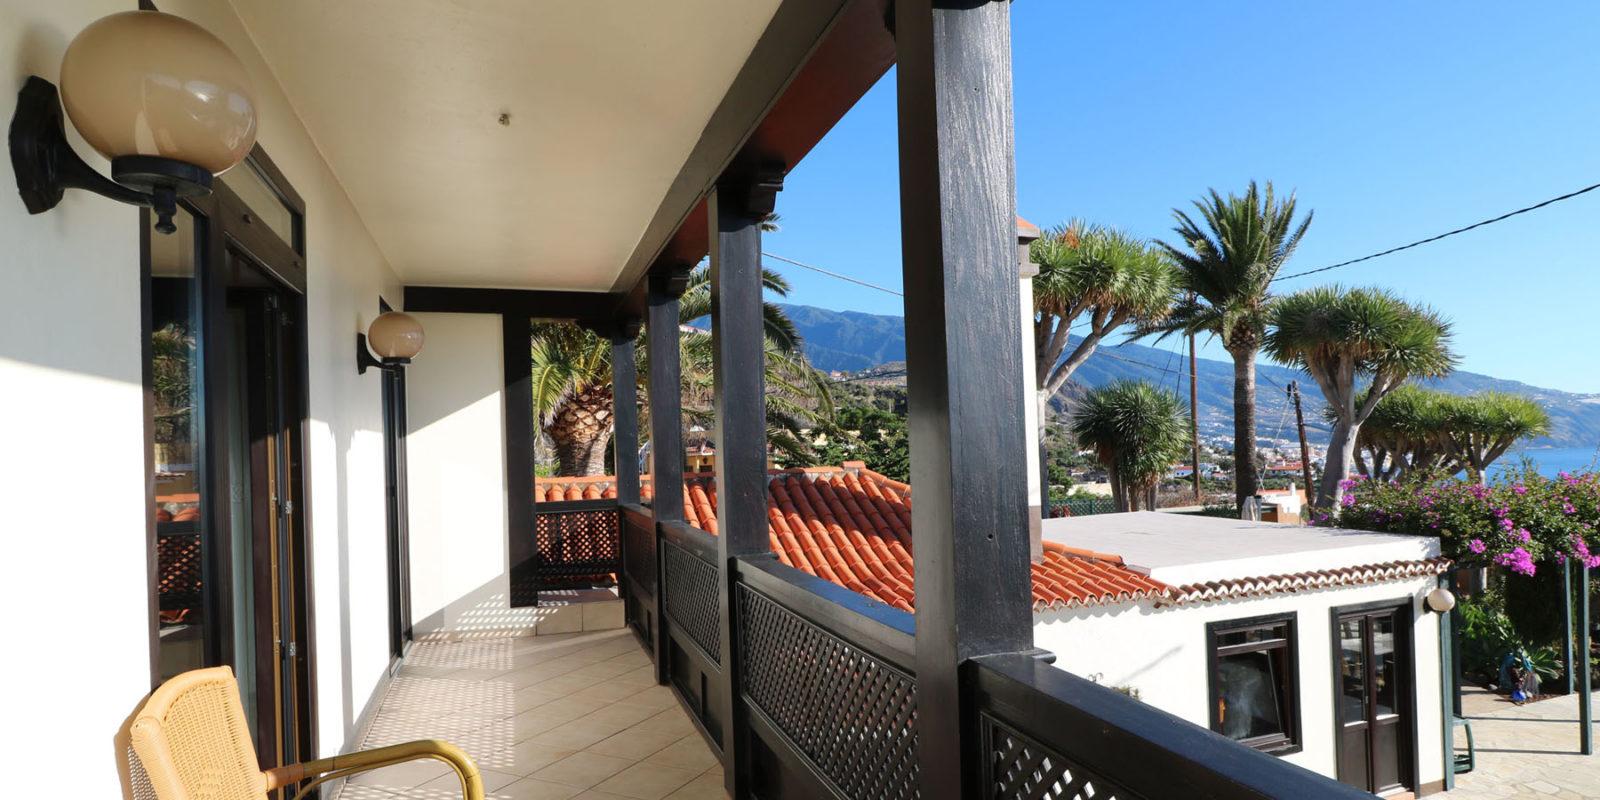 La Palma - Villa Escondida - Balcony